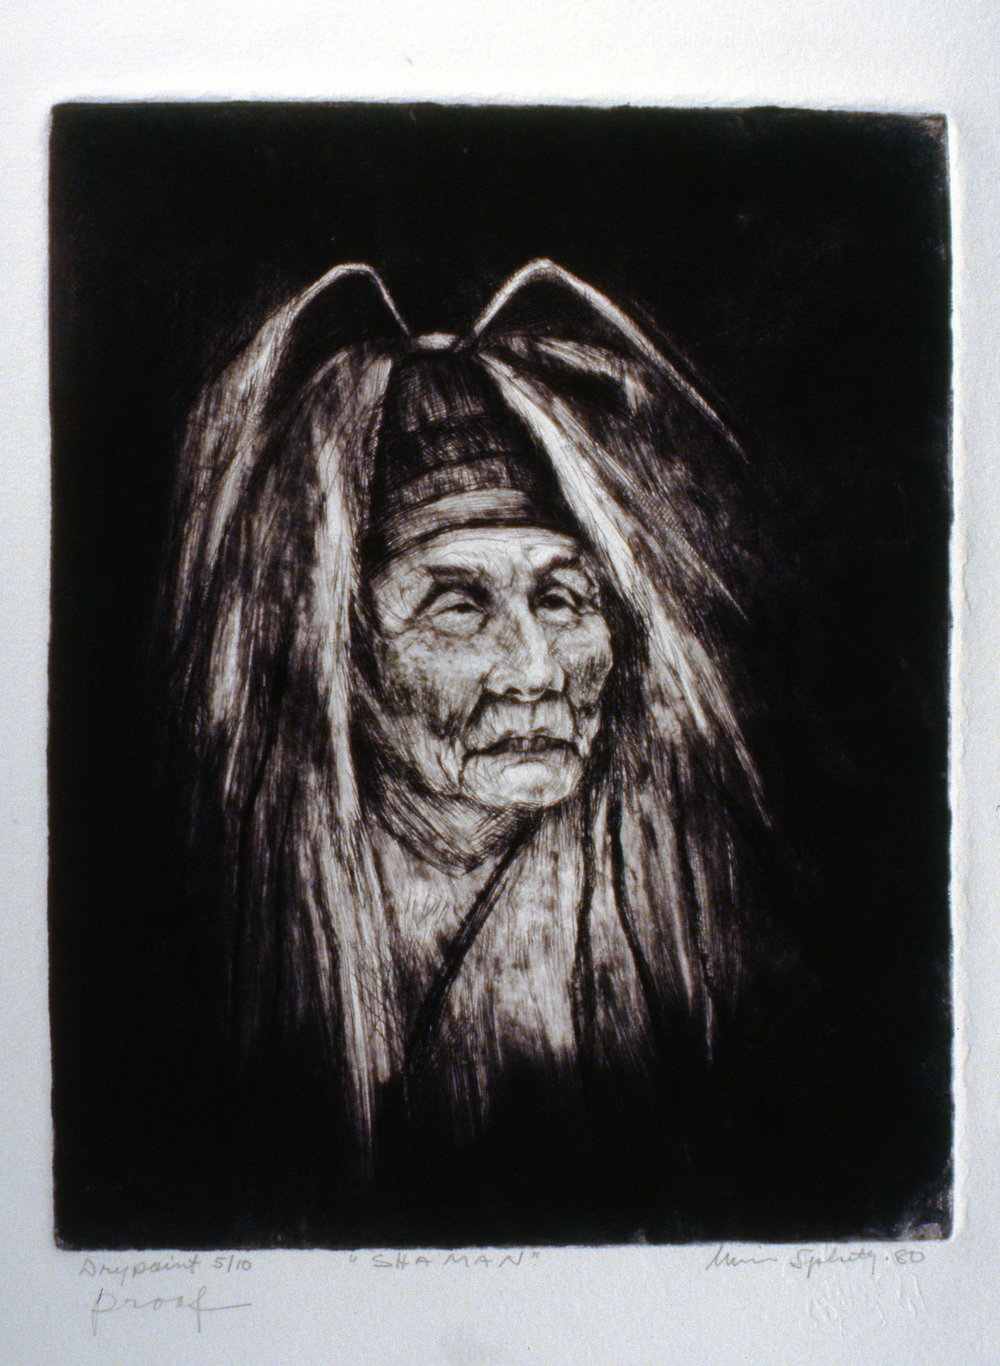 Shaman, 1980, Minn Sjløseth, artist proof marked 5/10, 25 x 20 cm, 1996.02.12